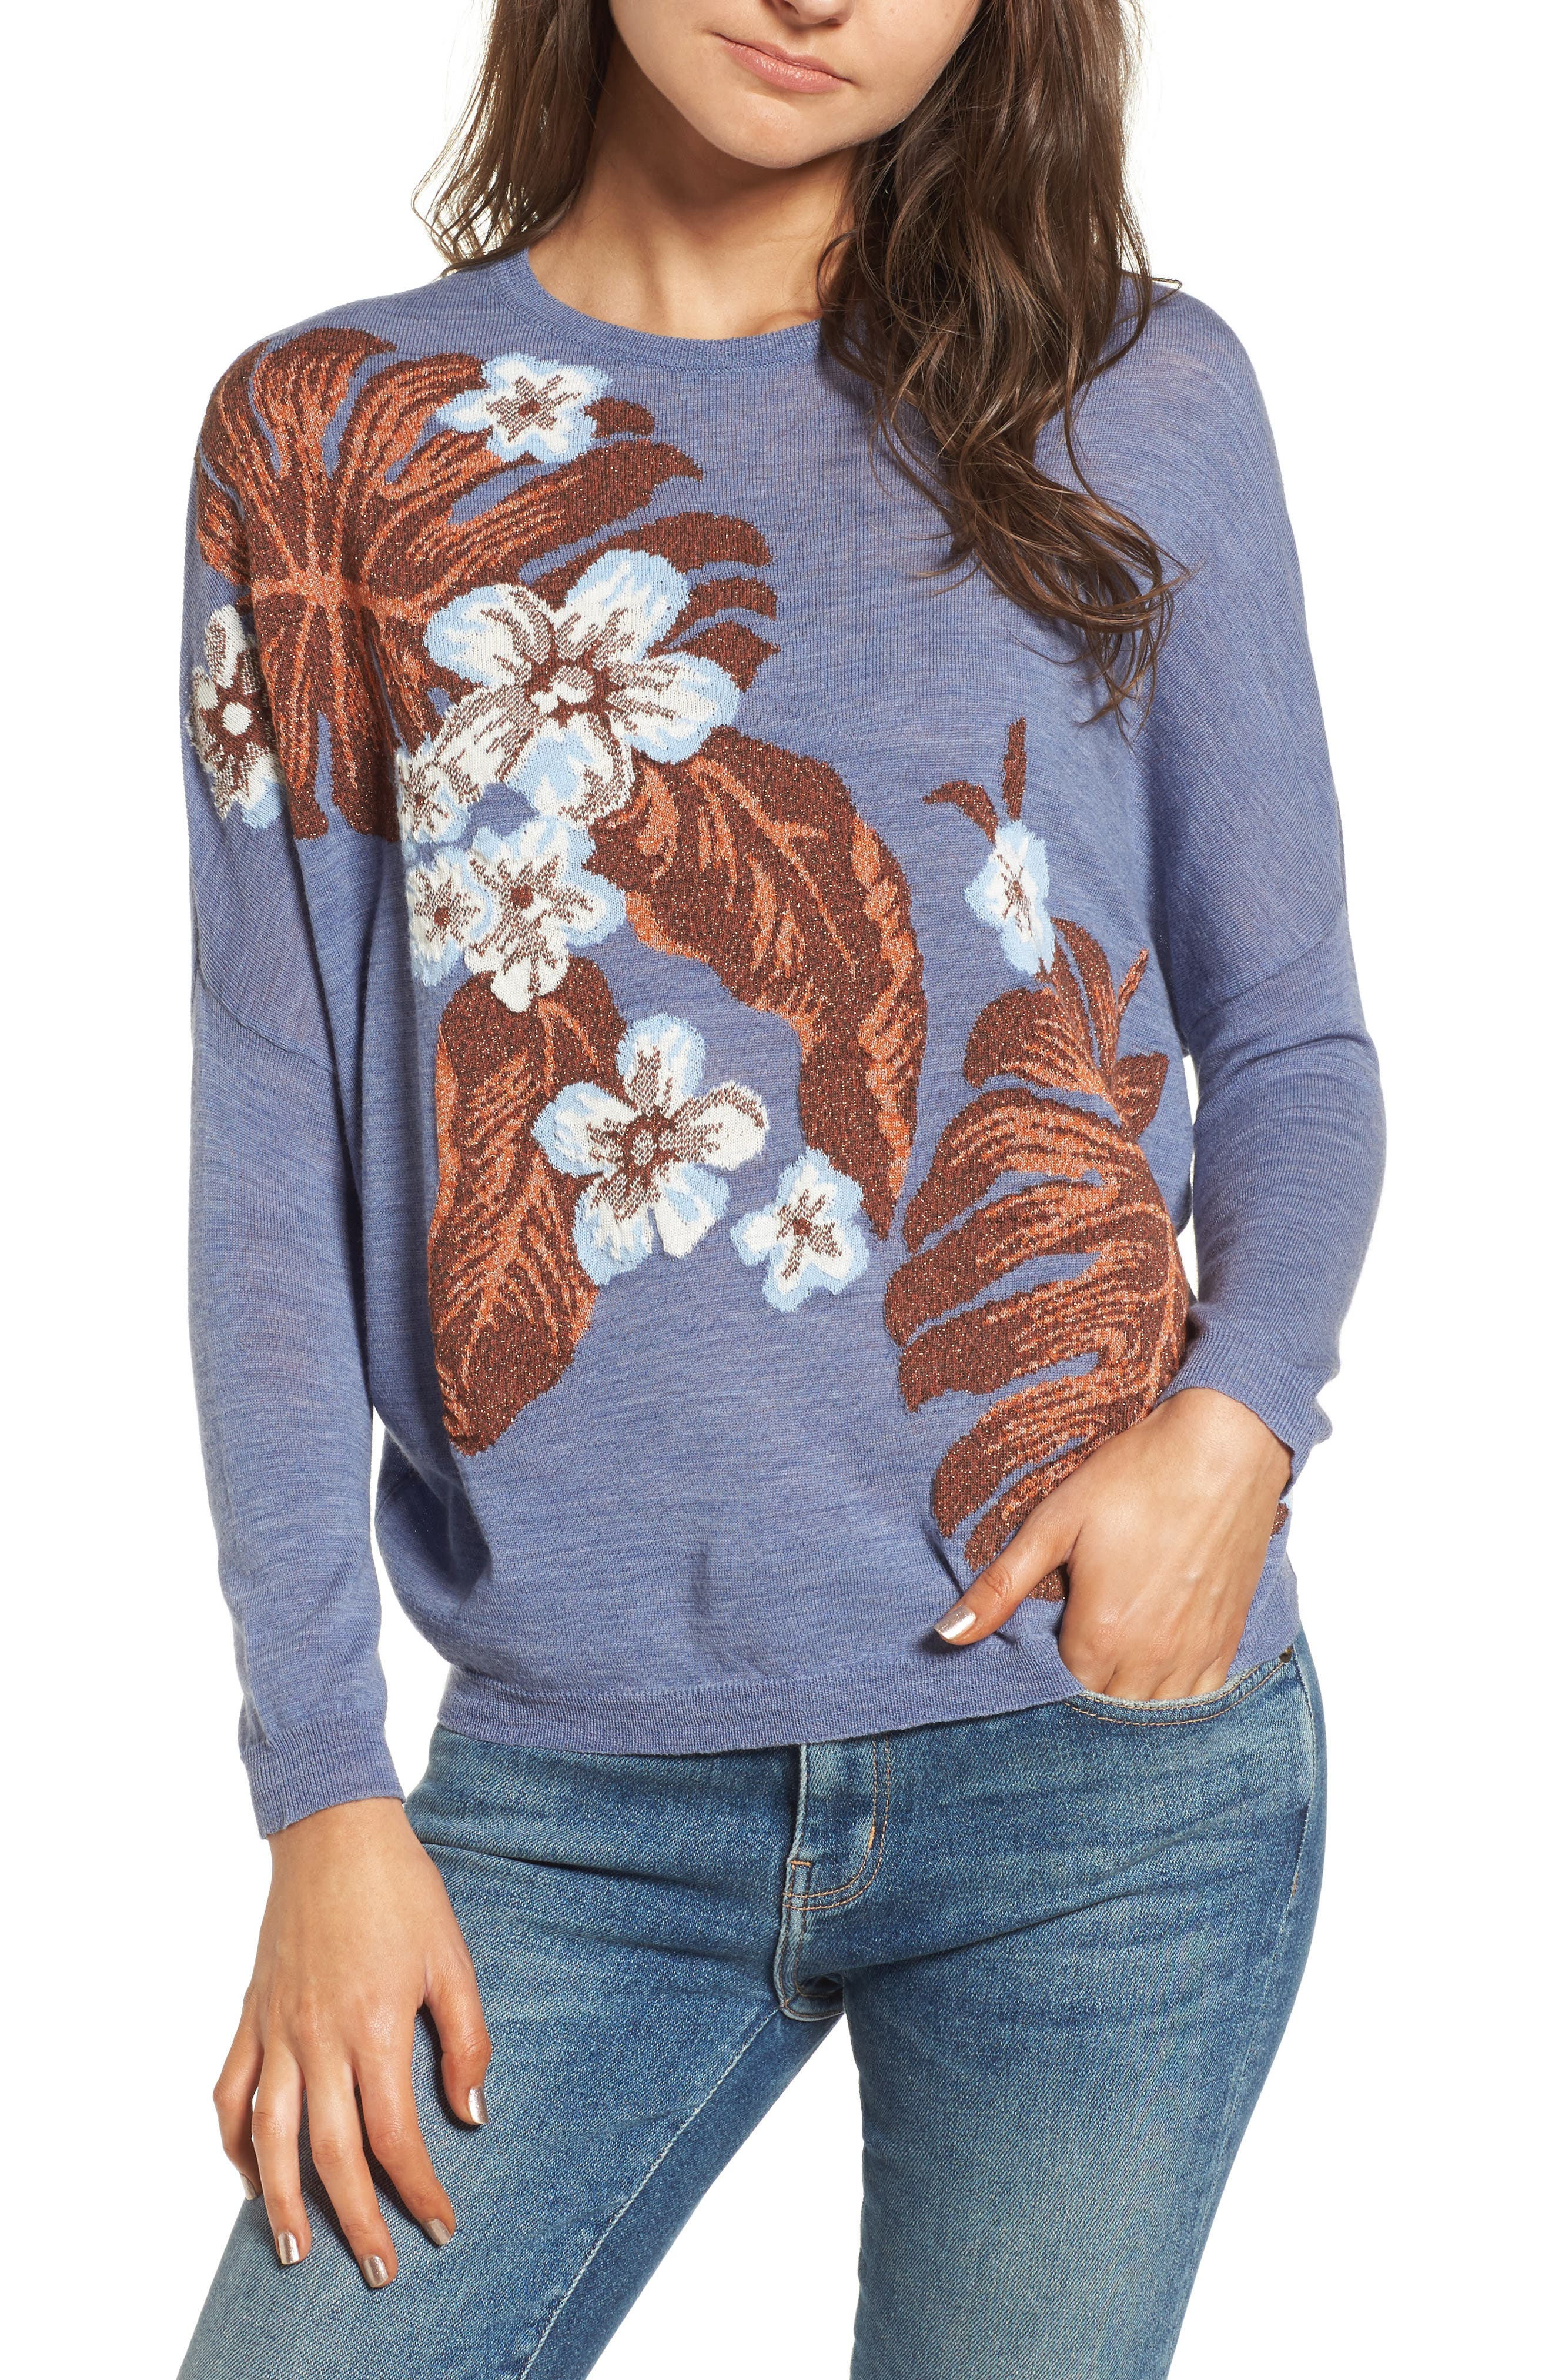 Blupalm Sweater,                             Main thumbnail 1, color,                             Denim